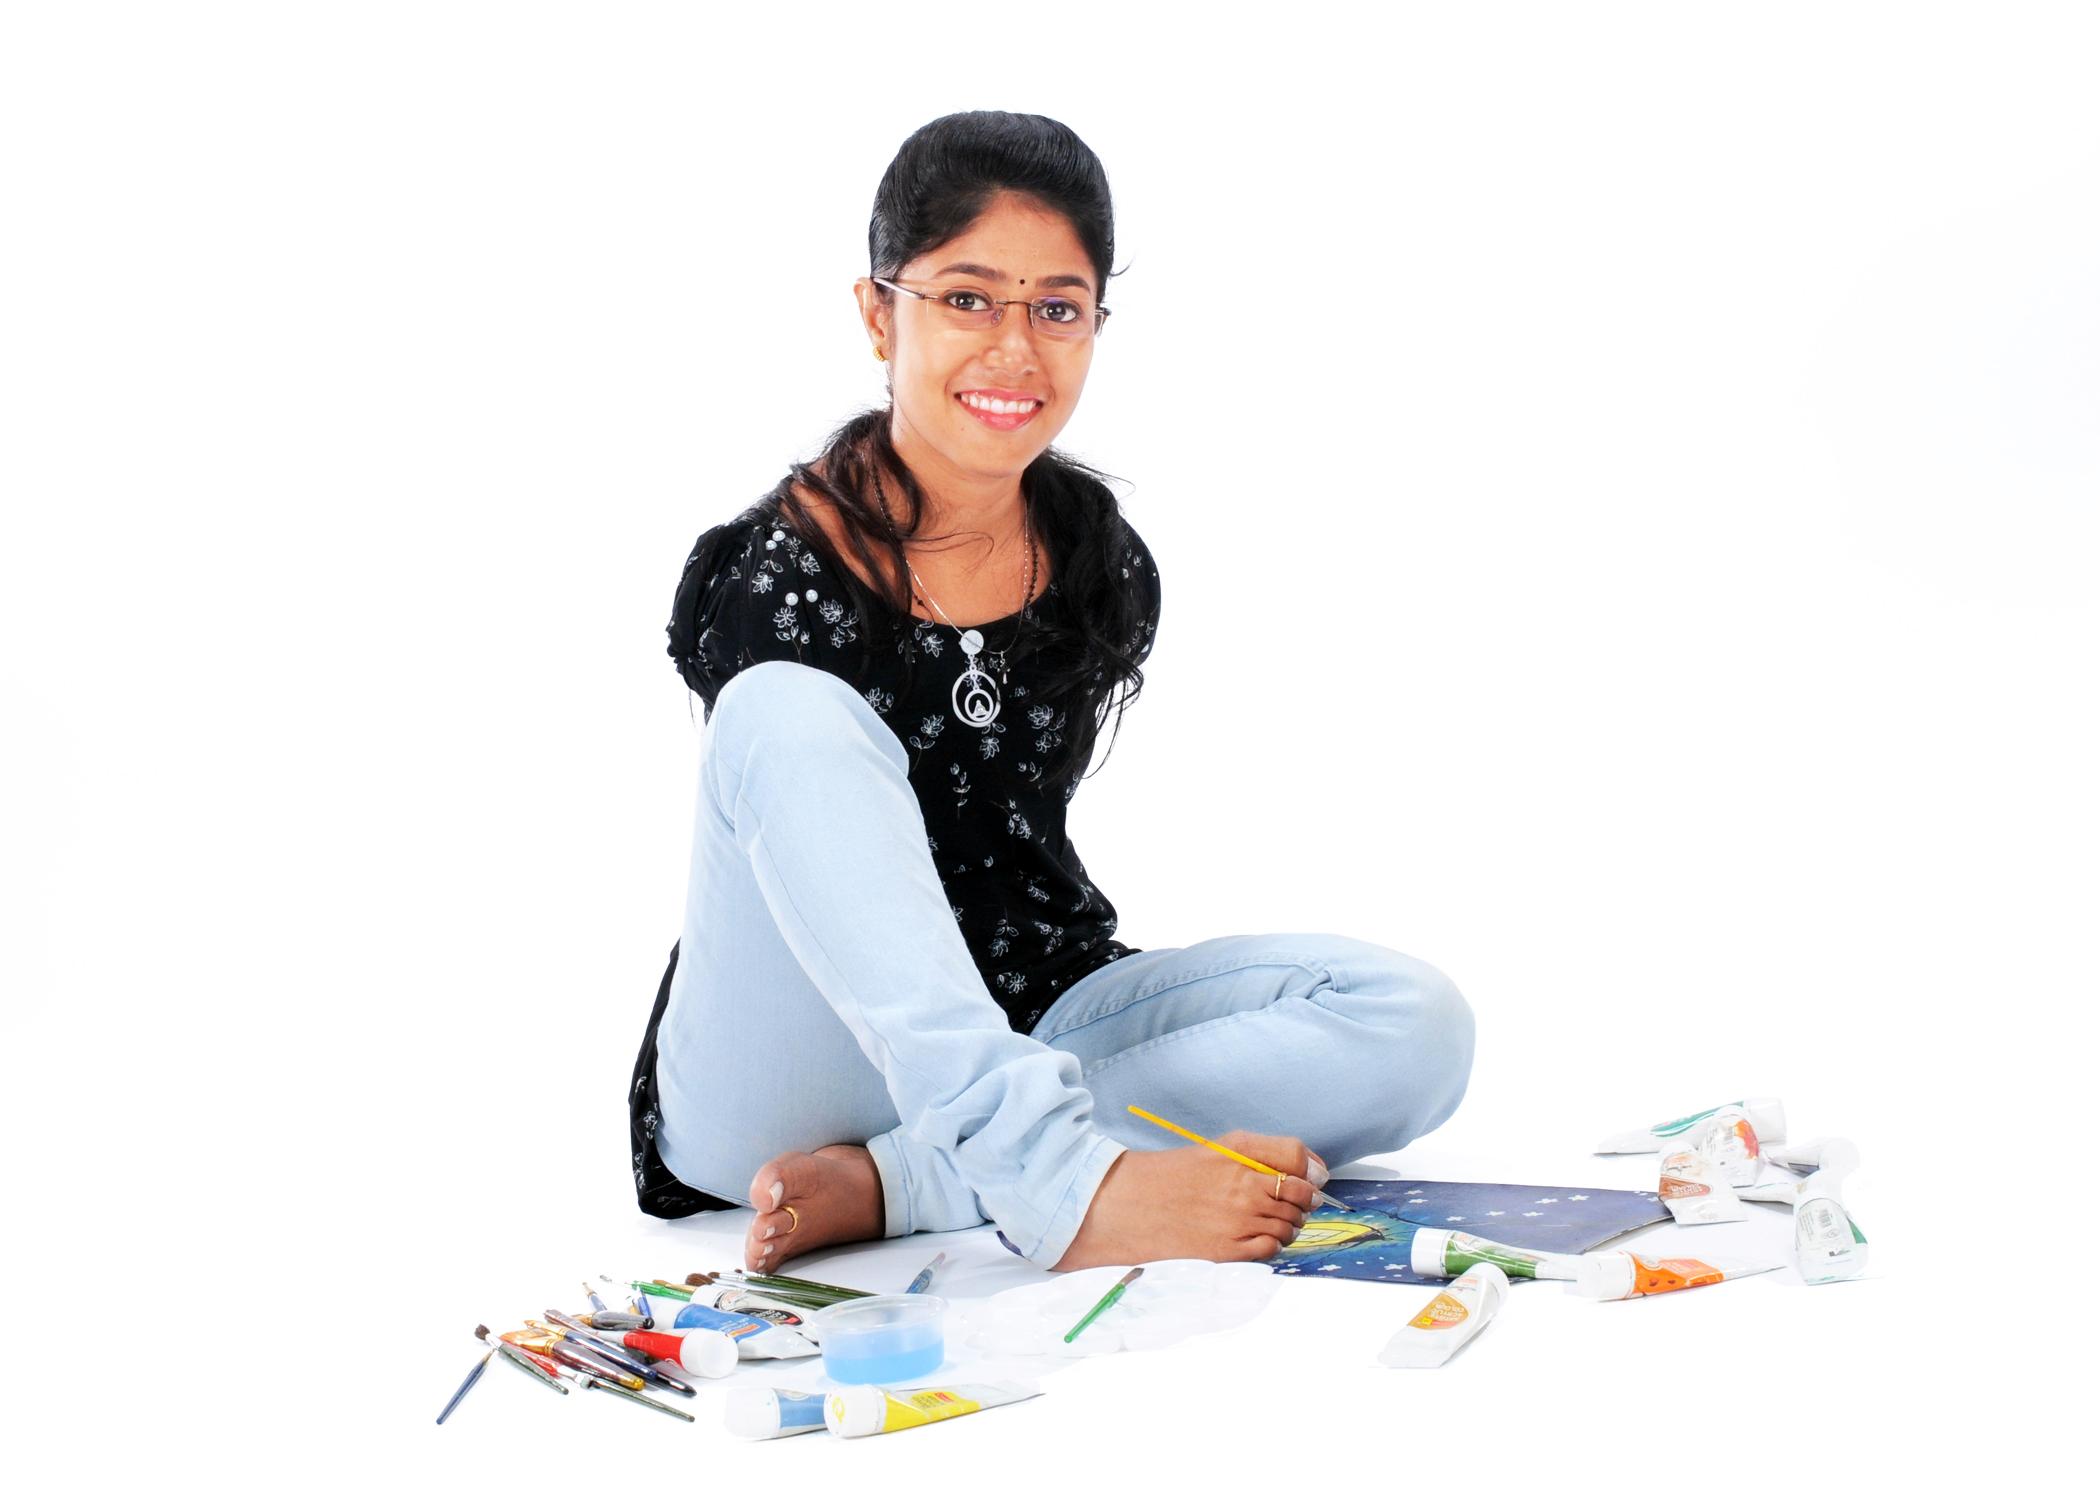 Happy feet: Kerala painter creates magic with her toes